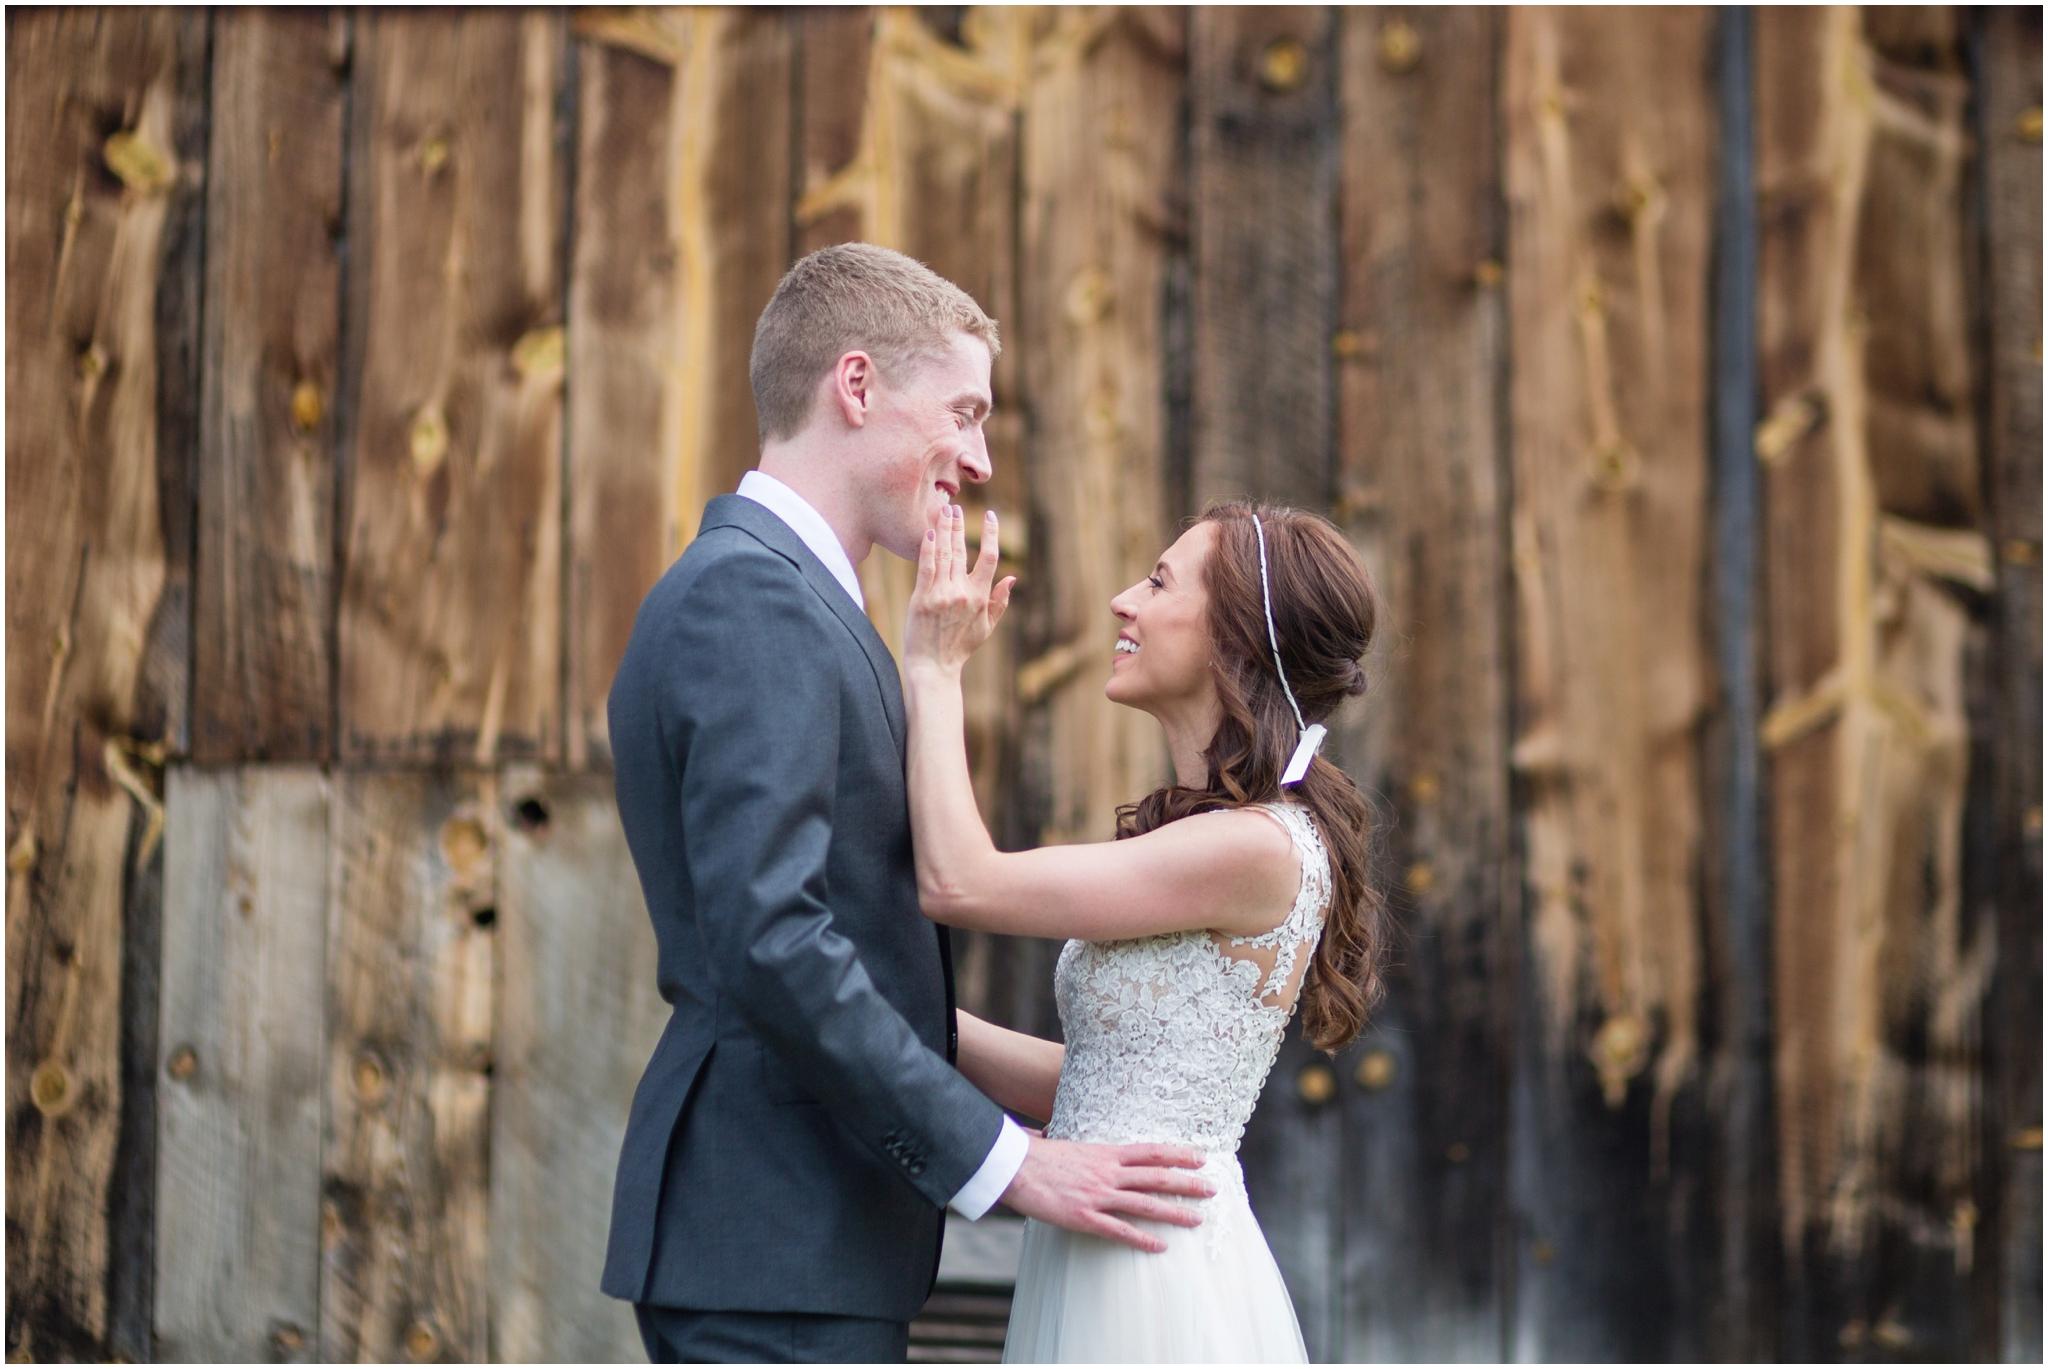 Evergreen_Wedding_Photographers_First_Look.JPG